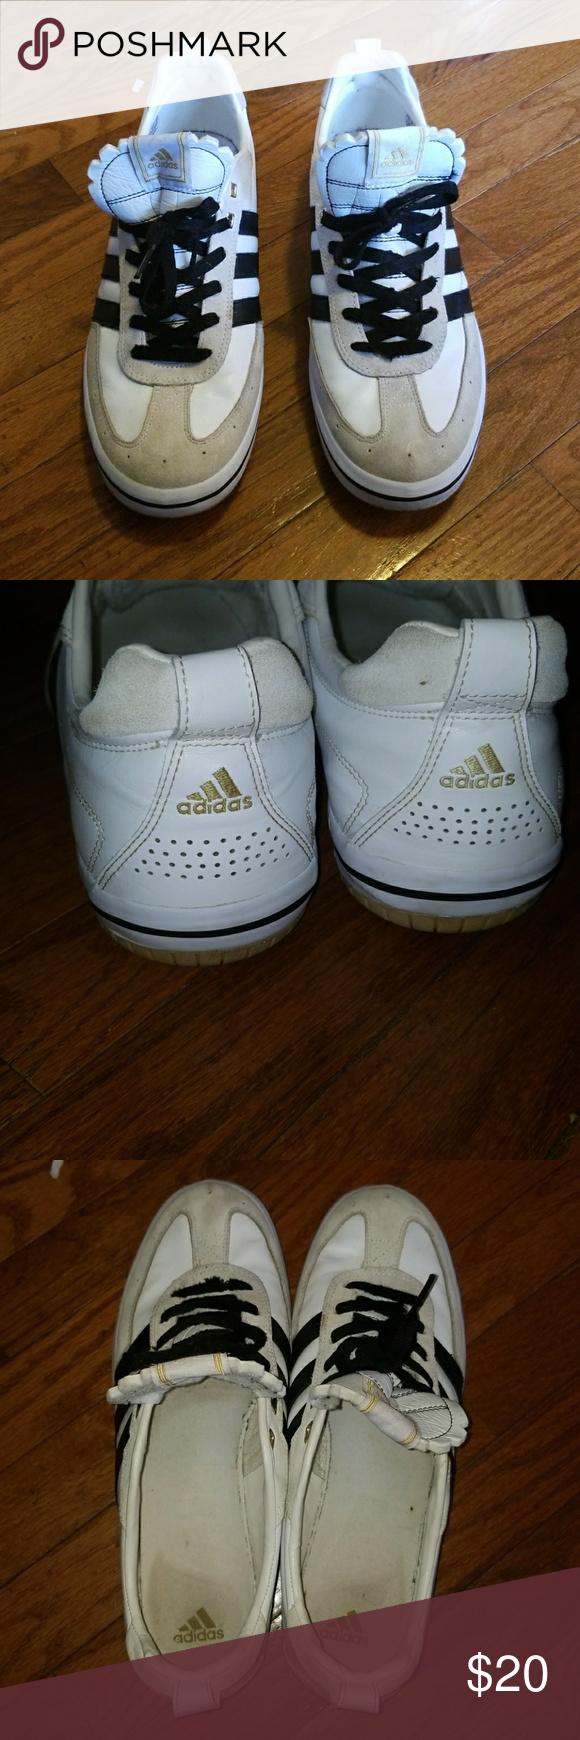 adidas Shoes New Campus Vulc Ii Cream